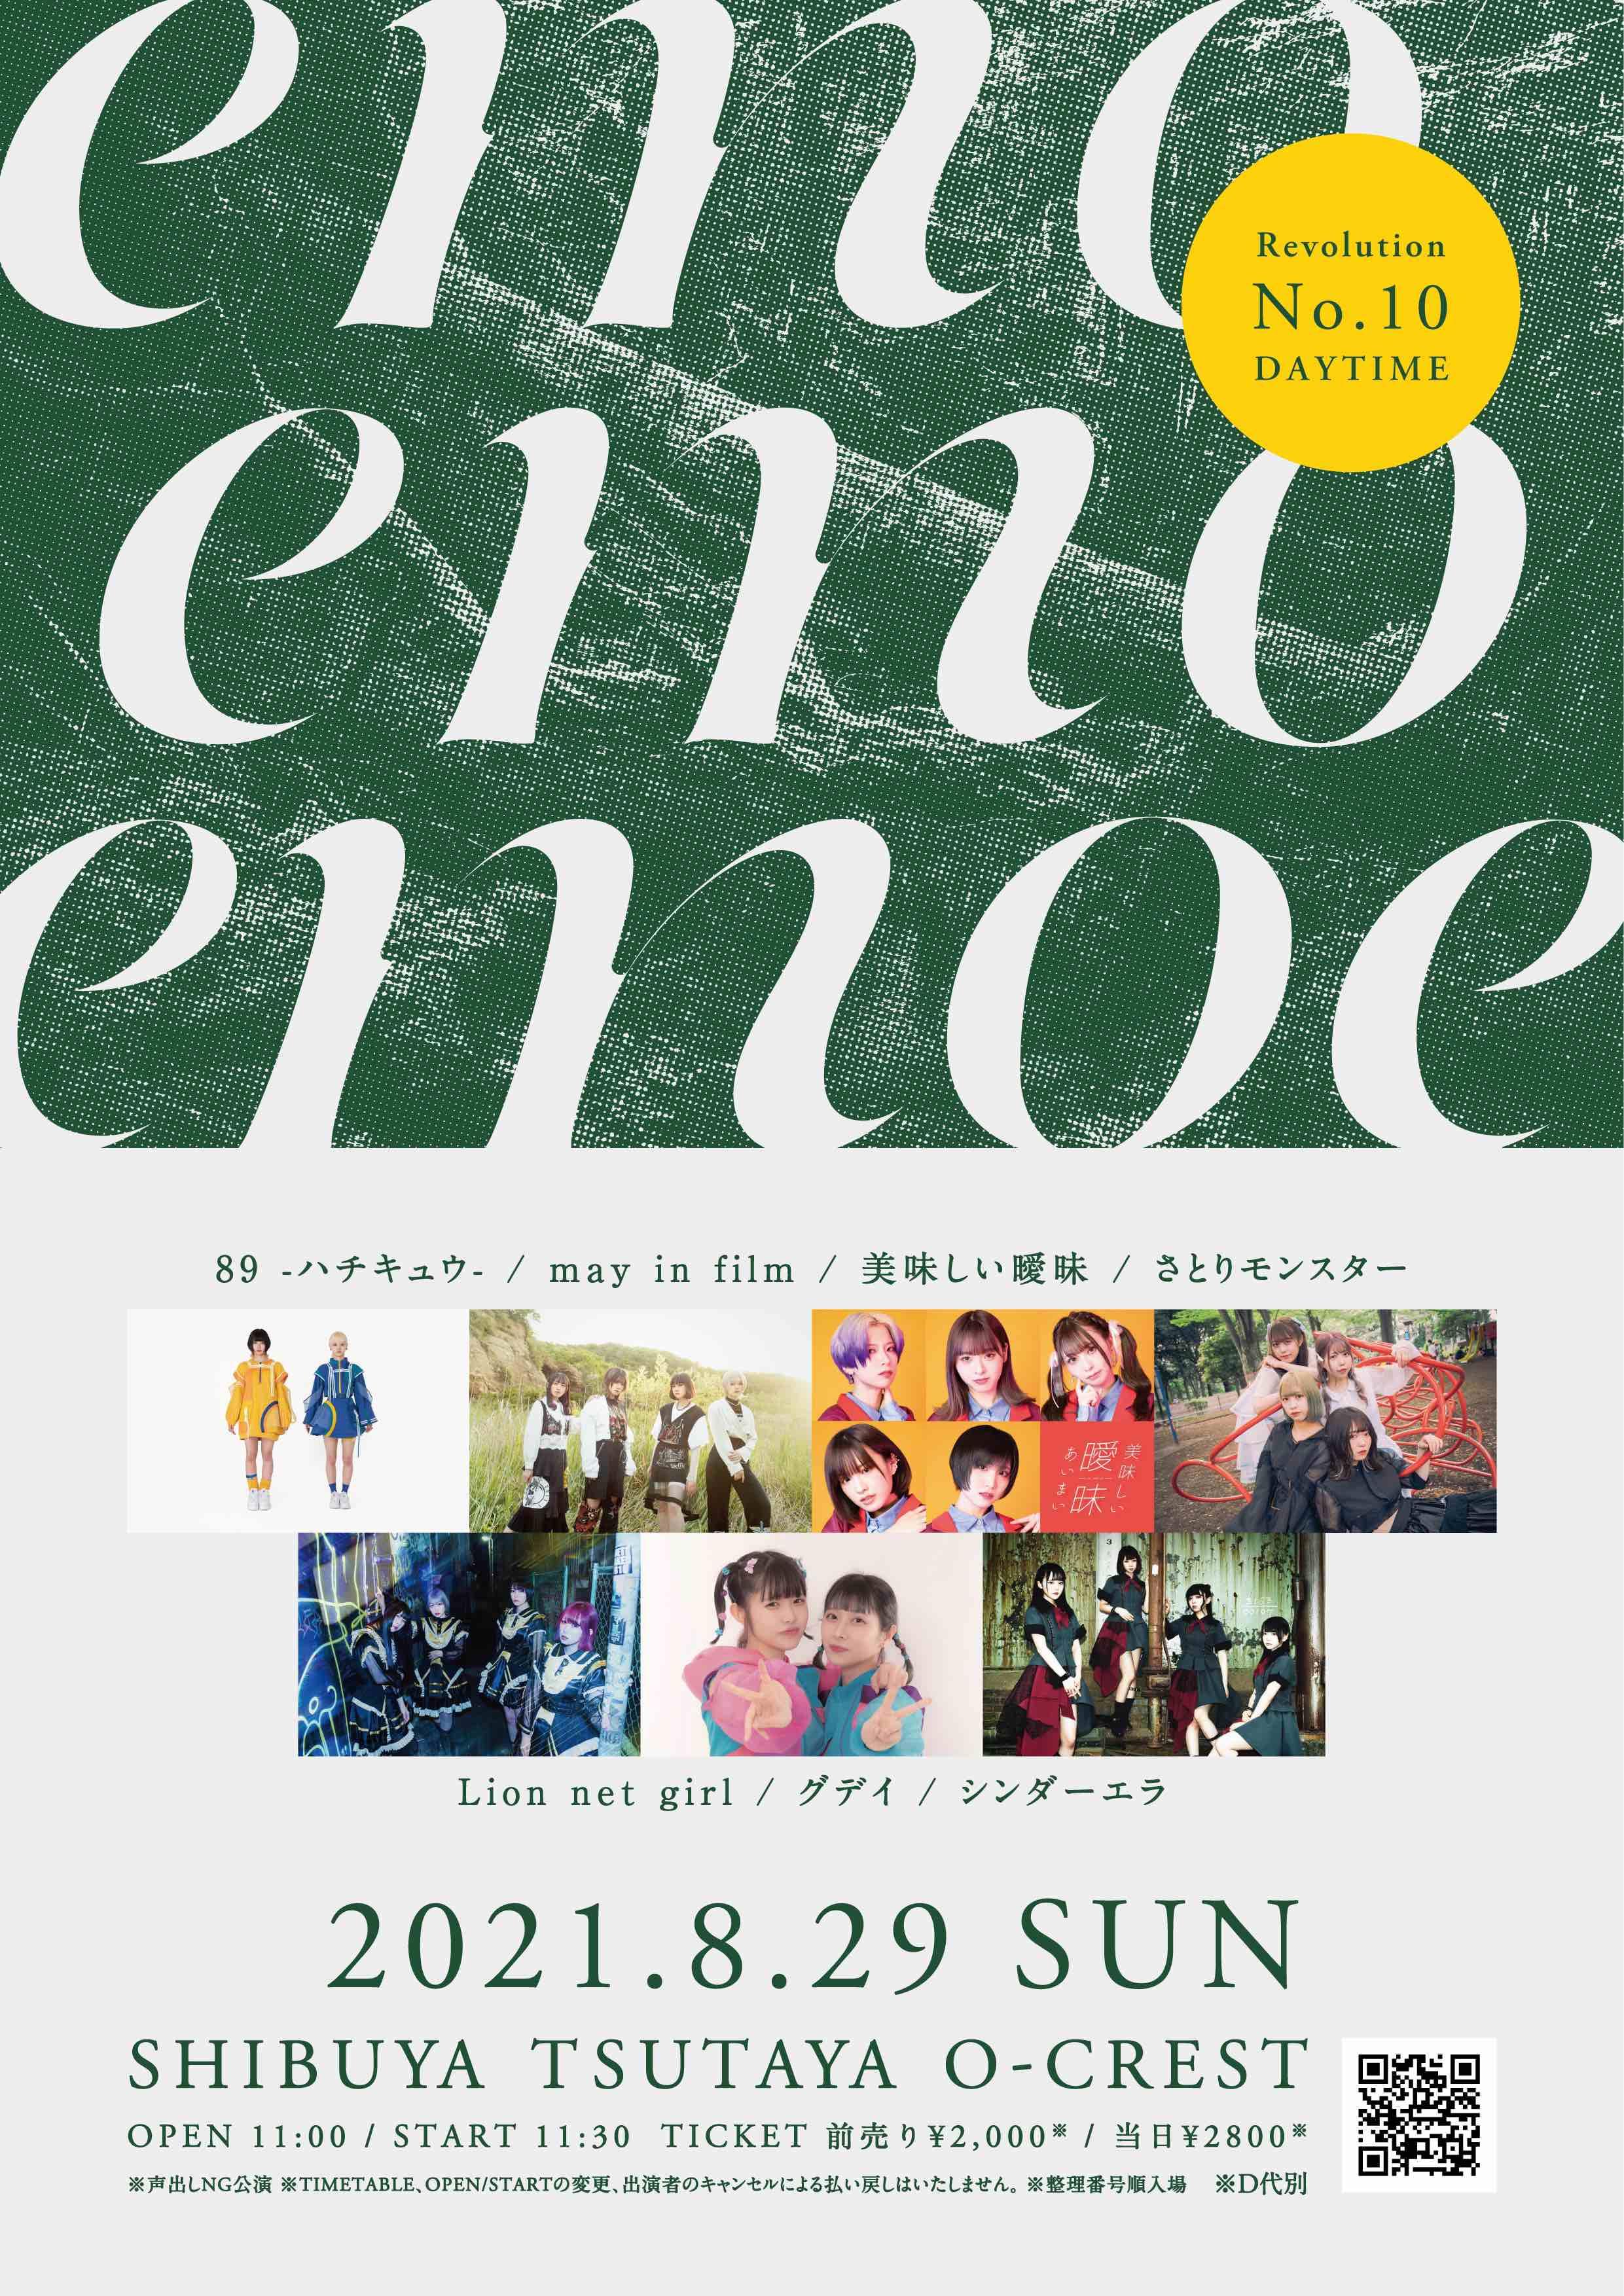 『emoemoemoe』 REVOLUTION No. 10   <DAY>